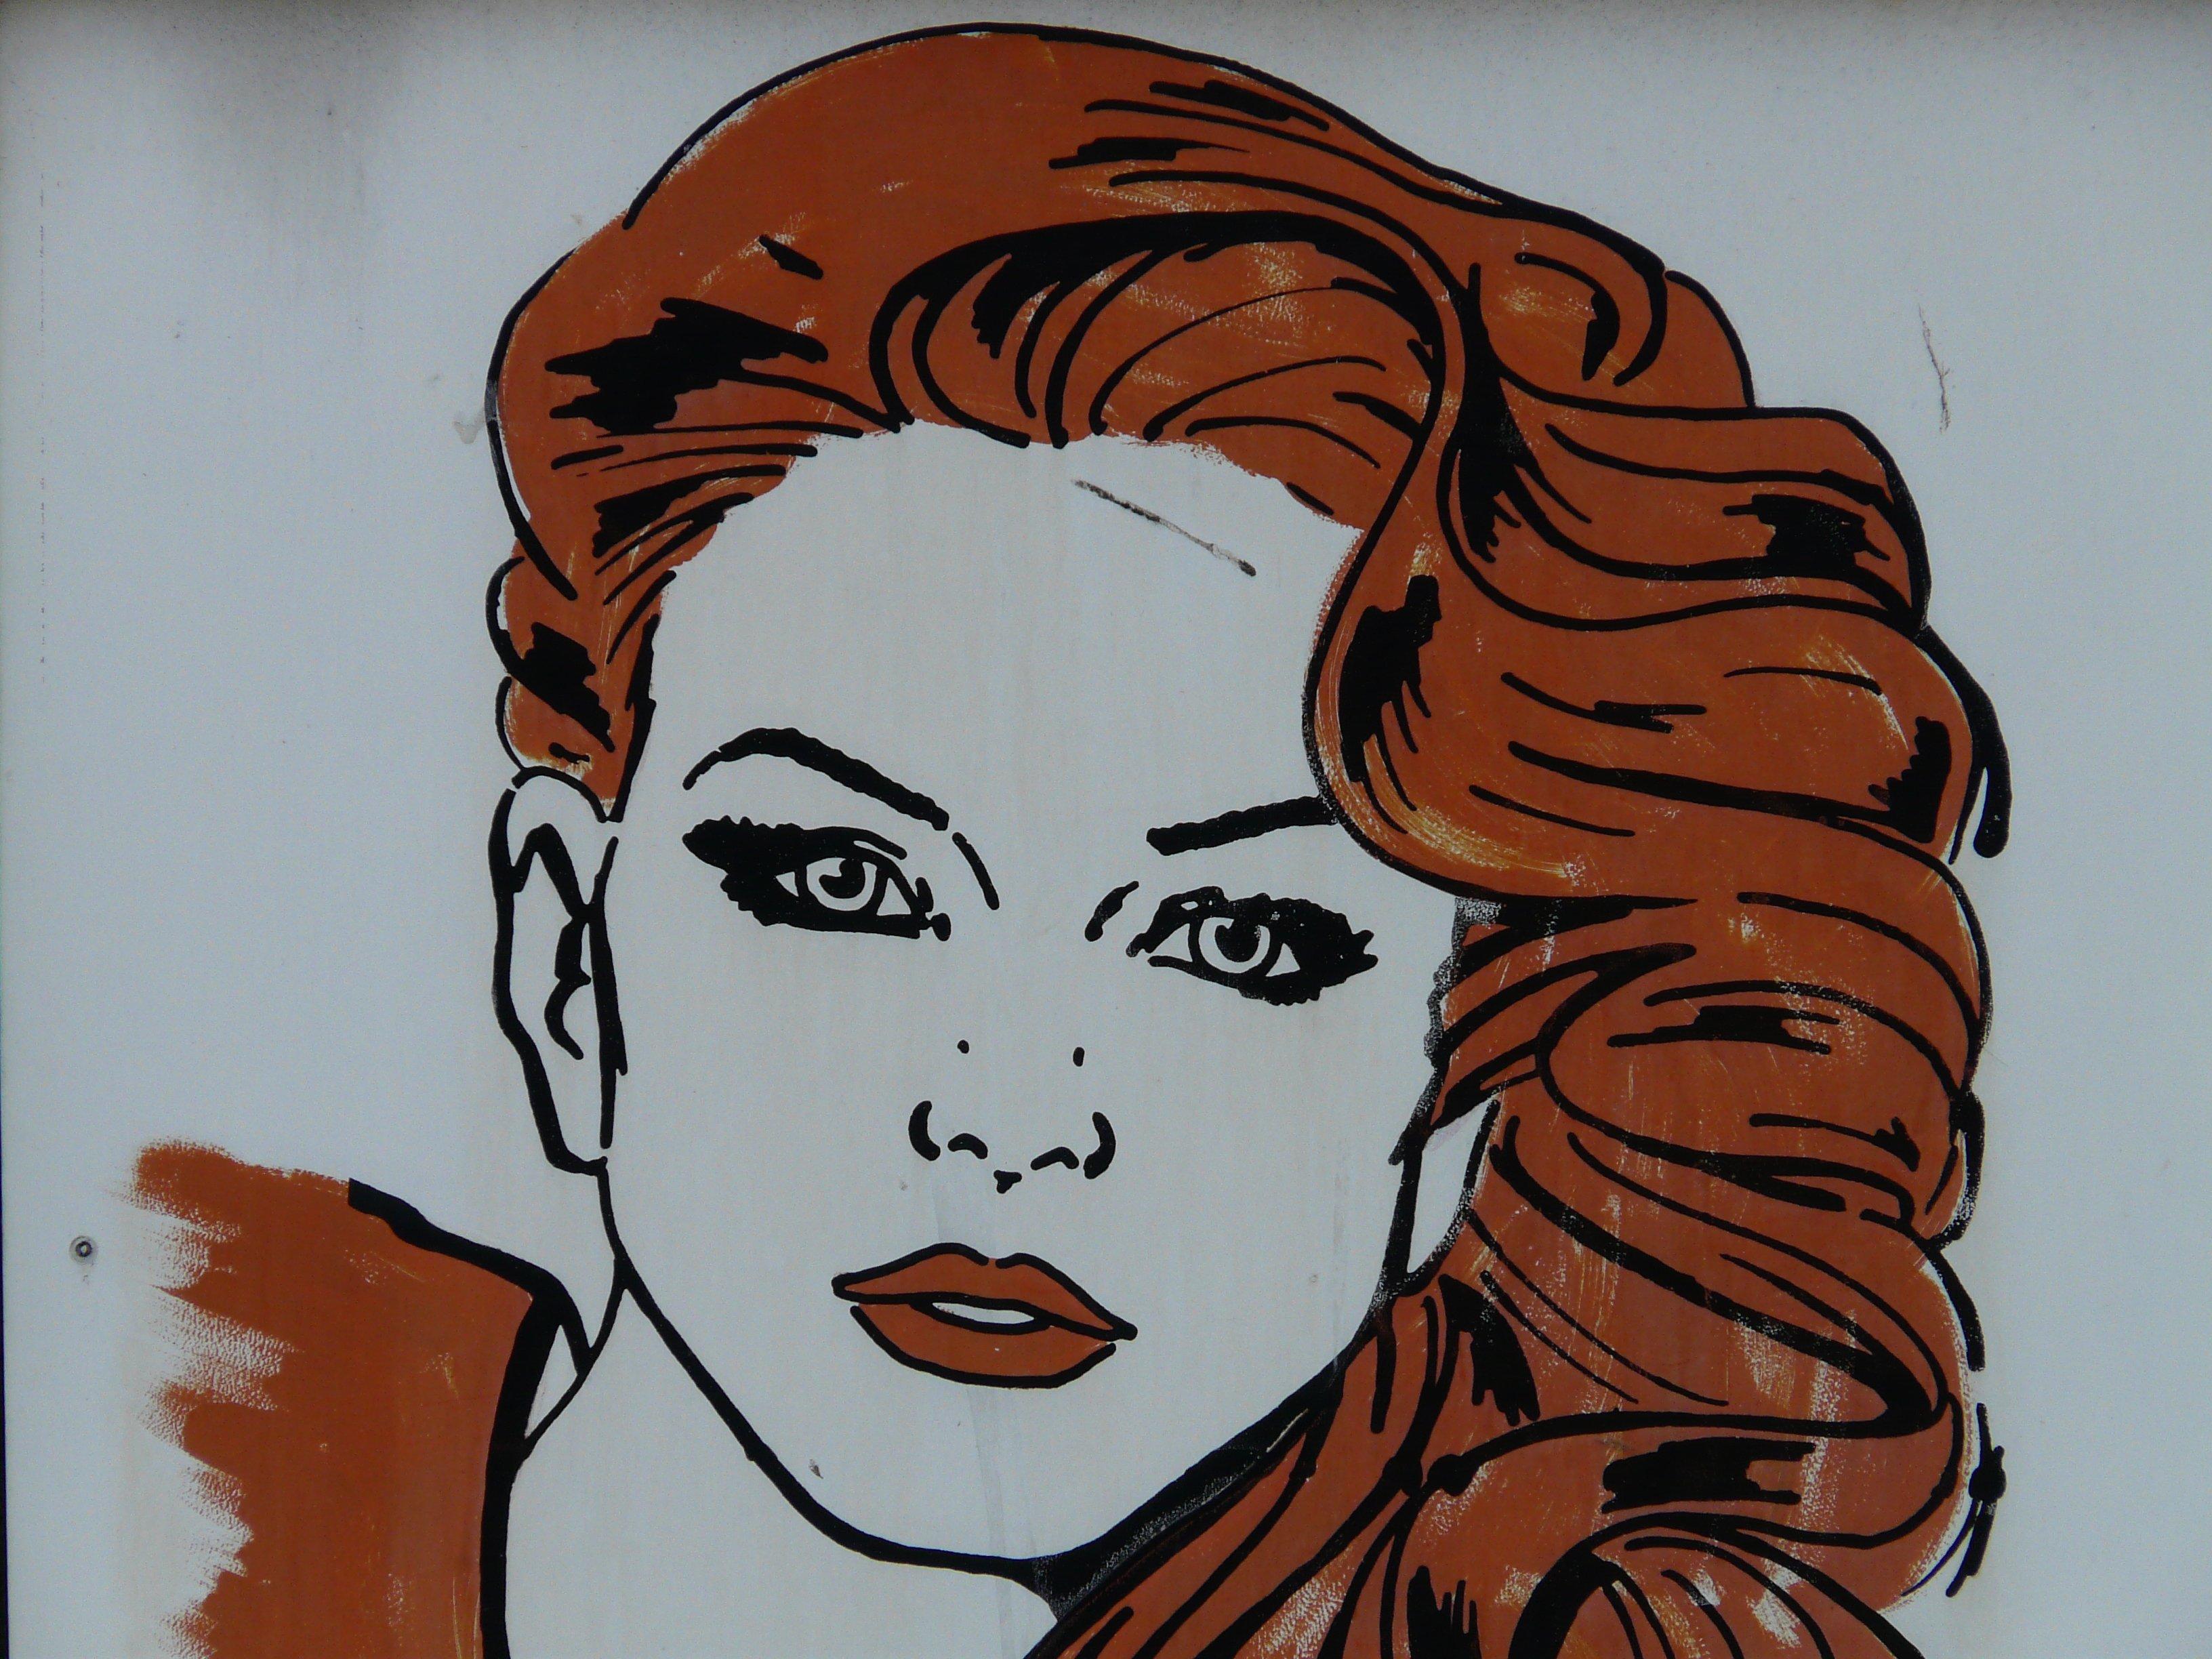 Gambar Wanita Rambut Warna Hairstyle Mulut Menghadapi